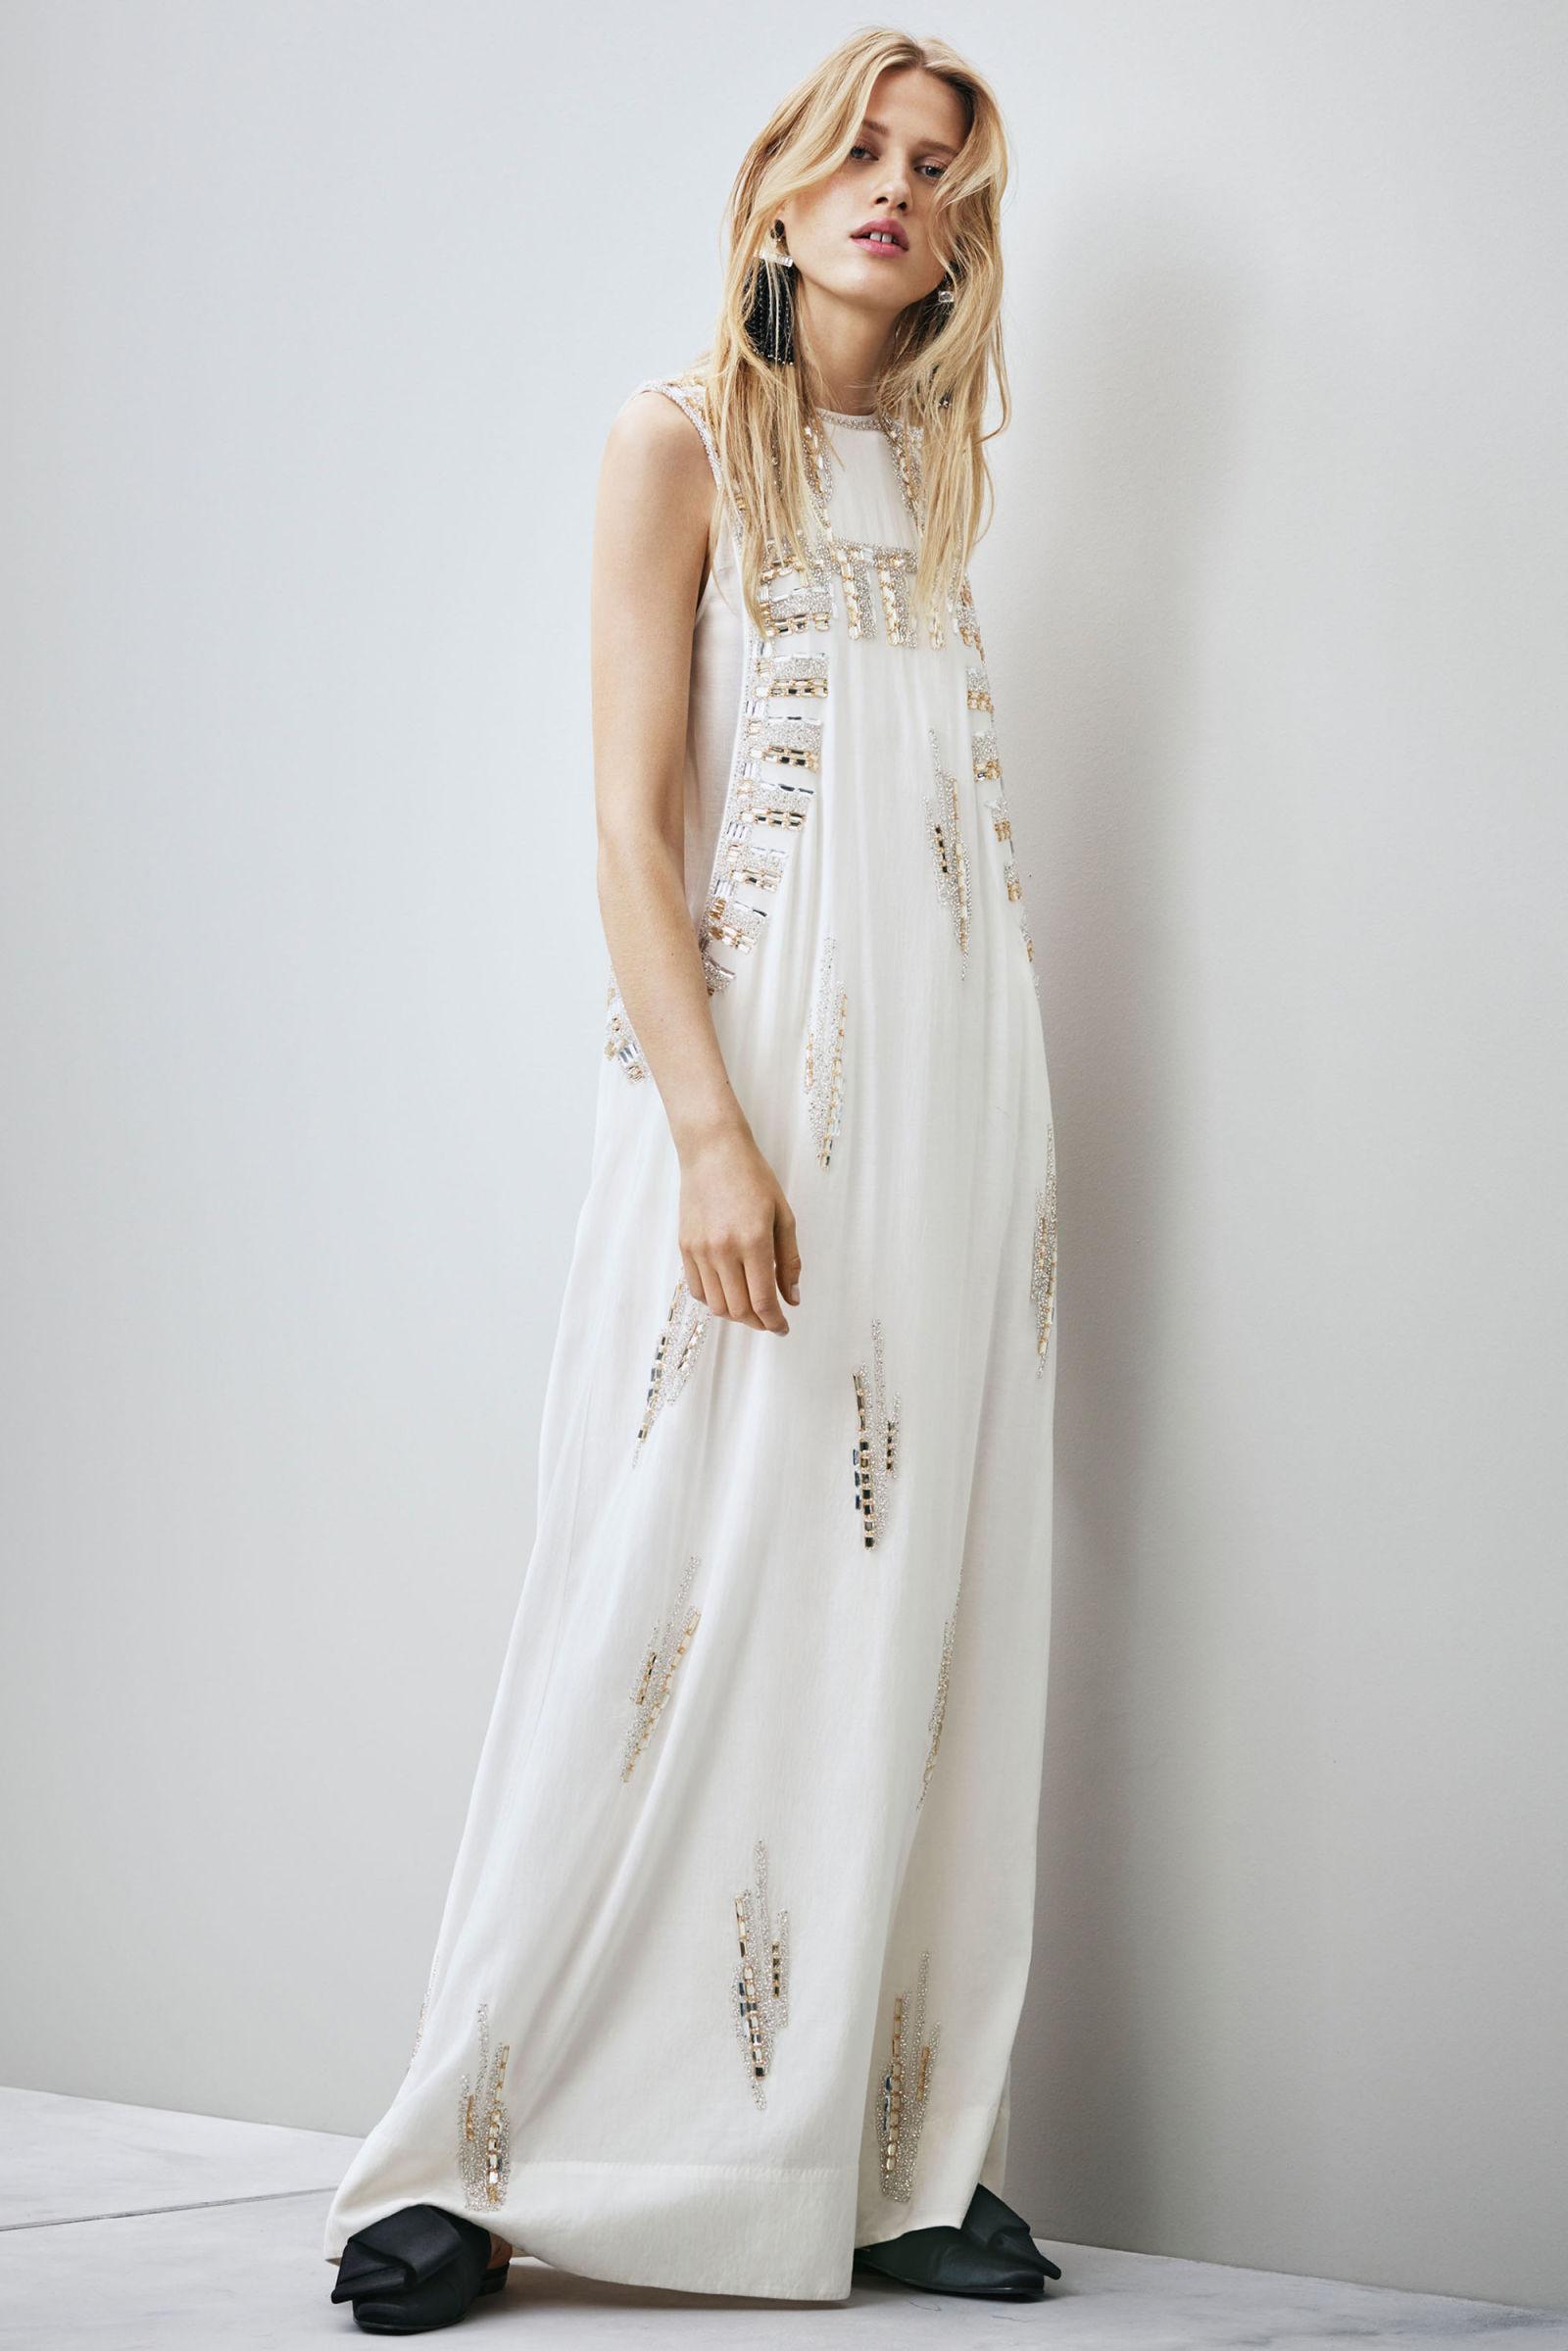 Victoria\'s Secret Wedding Dress | Dress images